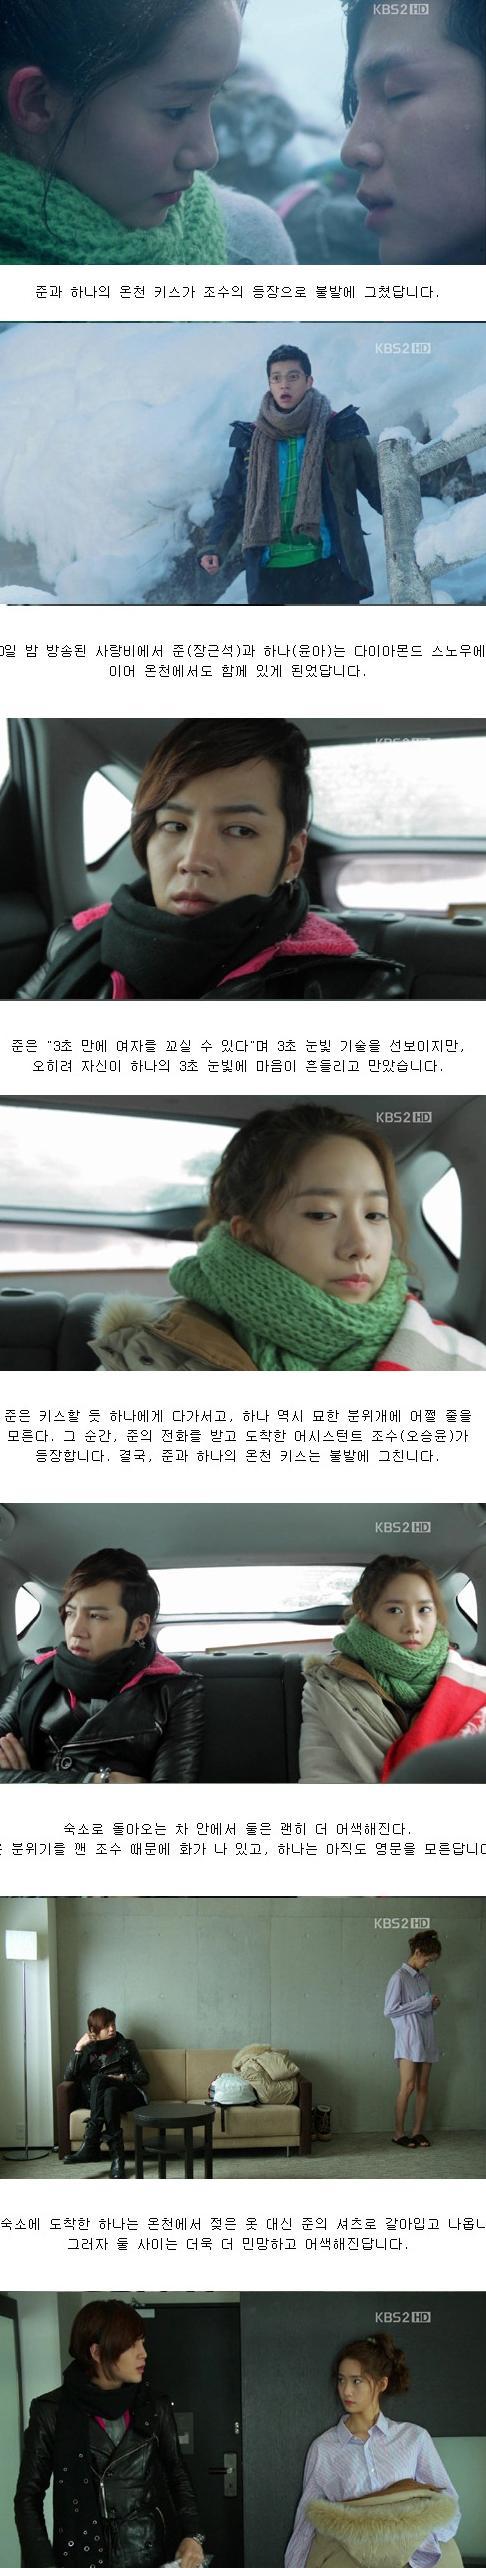 Spoiler] Added episode 6 captures for the Korean drama 'Love